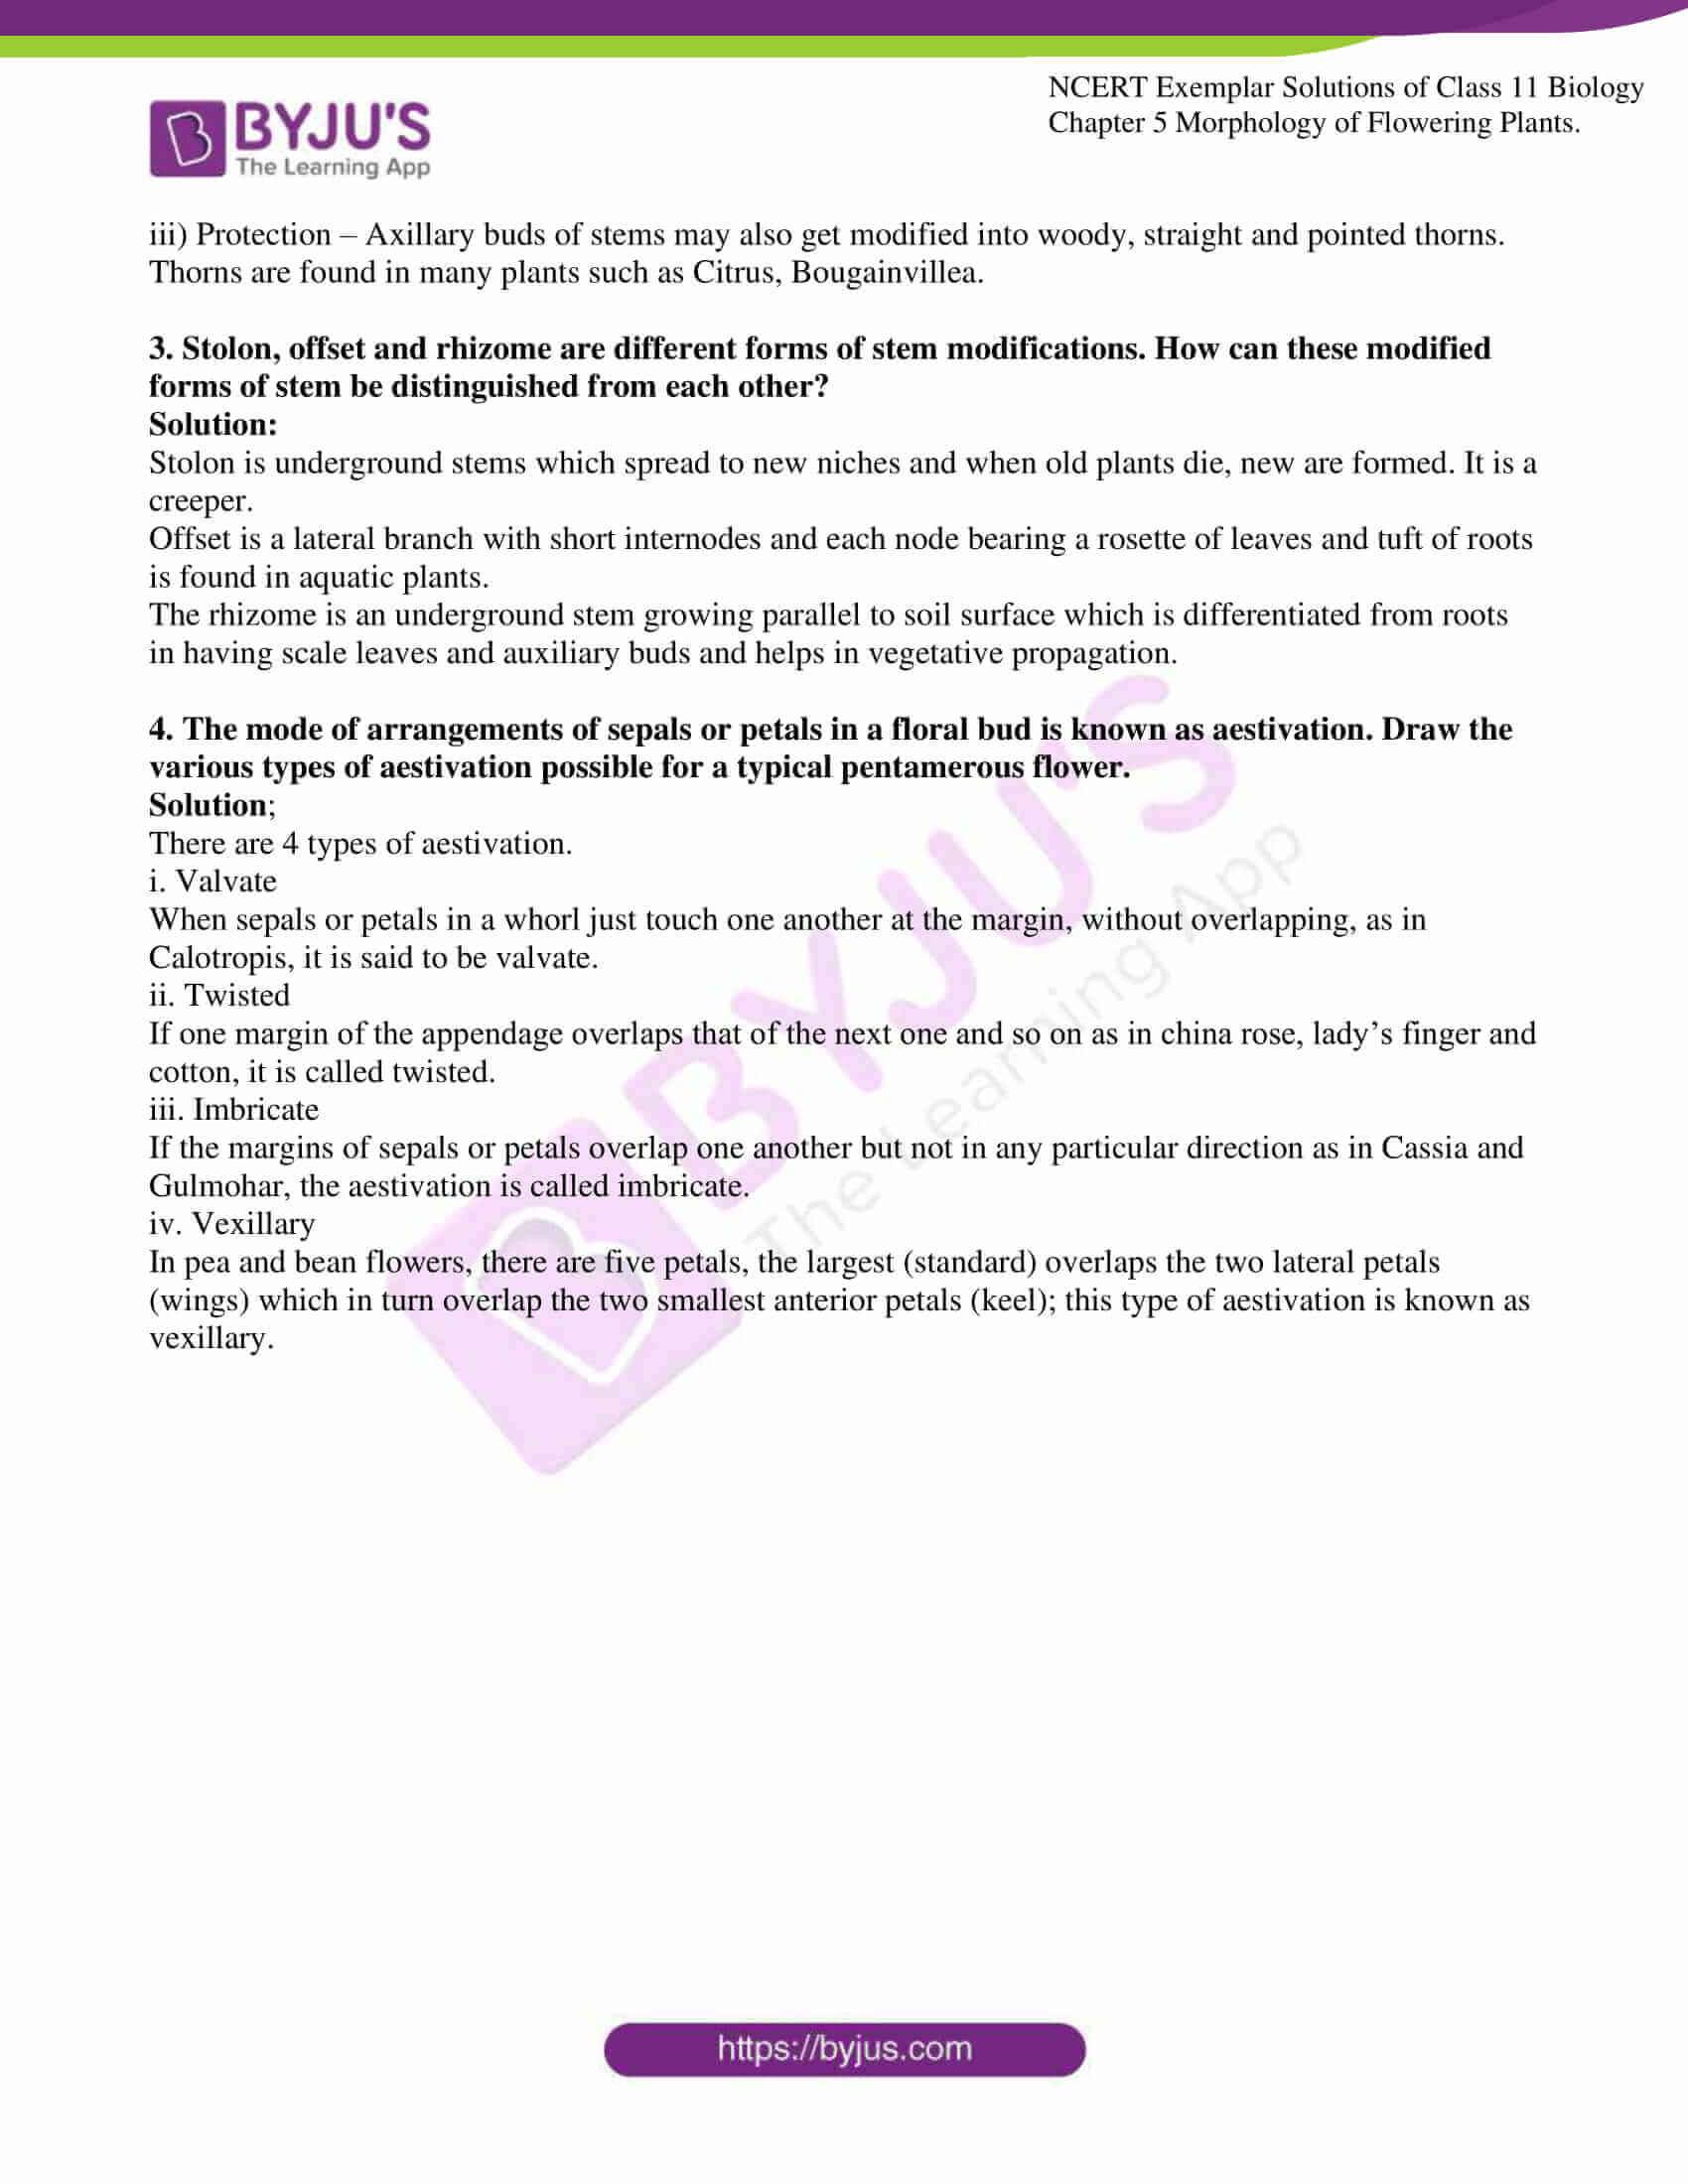 ncert exemplar solutions for class 11 bio chapter 5 10